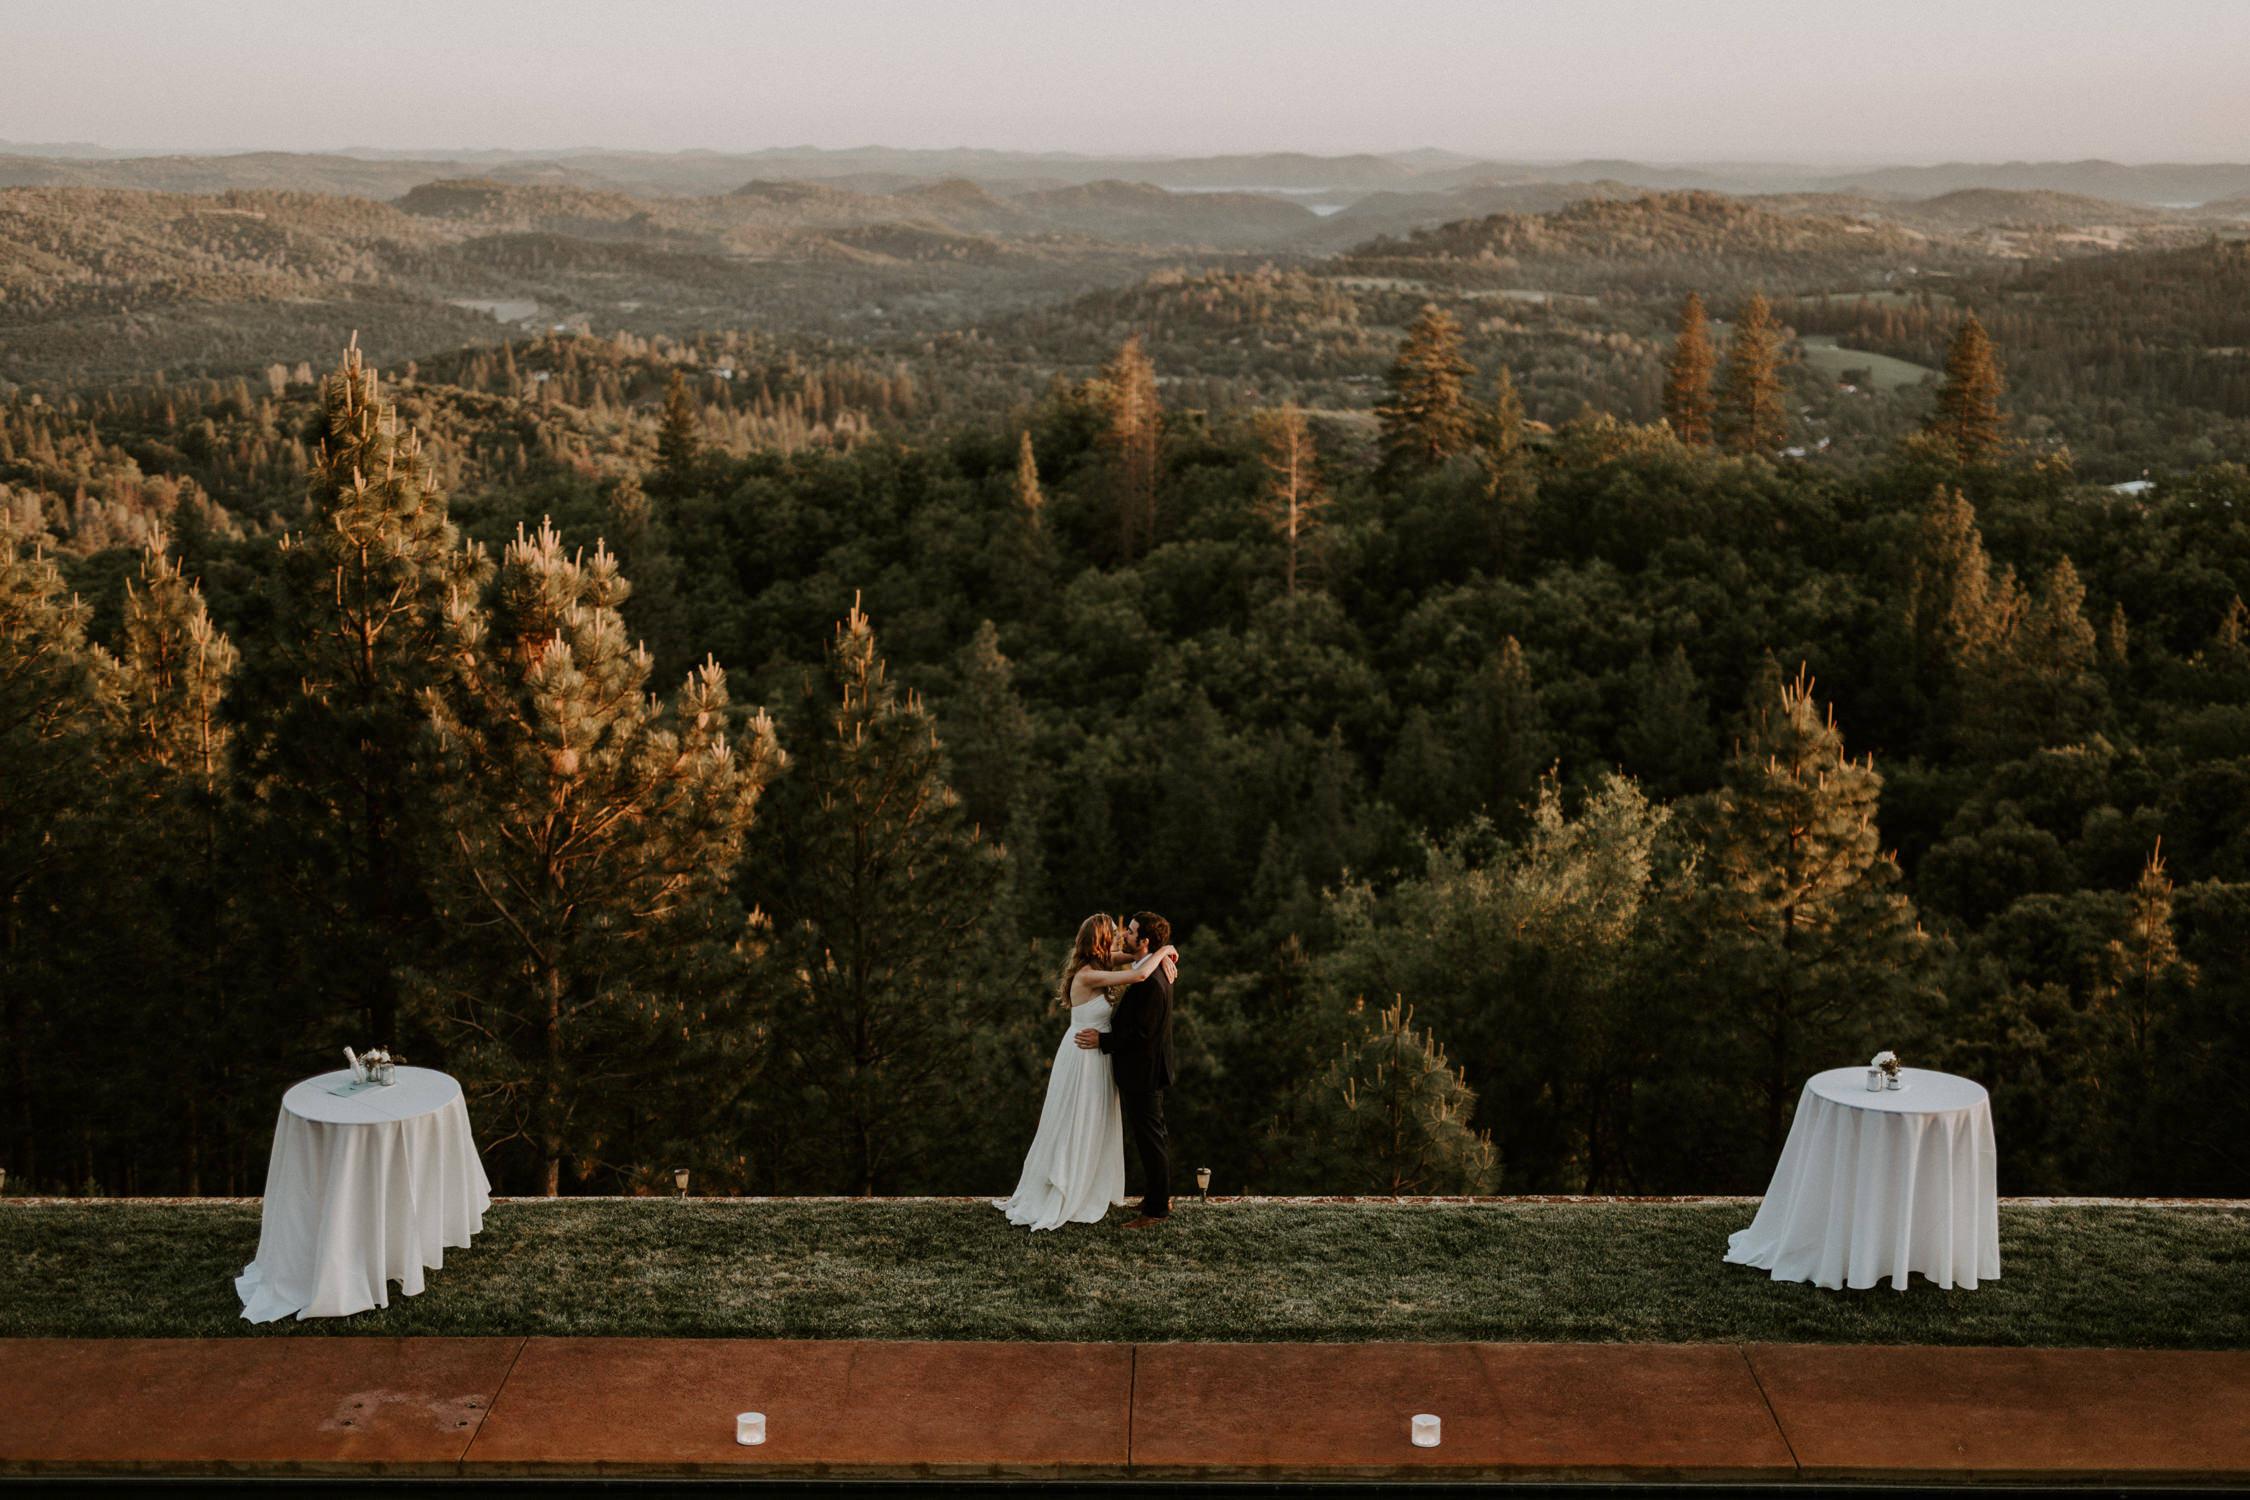 couple-wedding-northern-california_0148.jpg